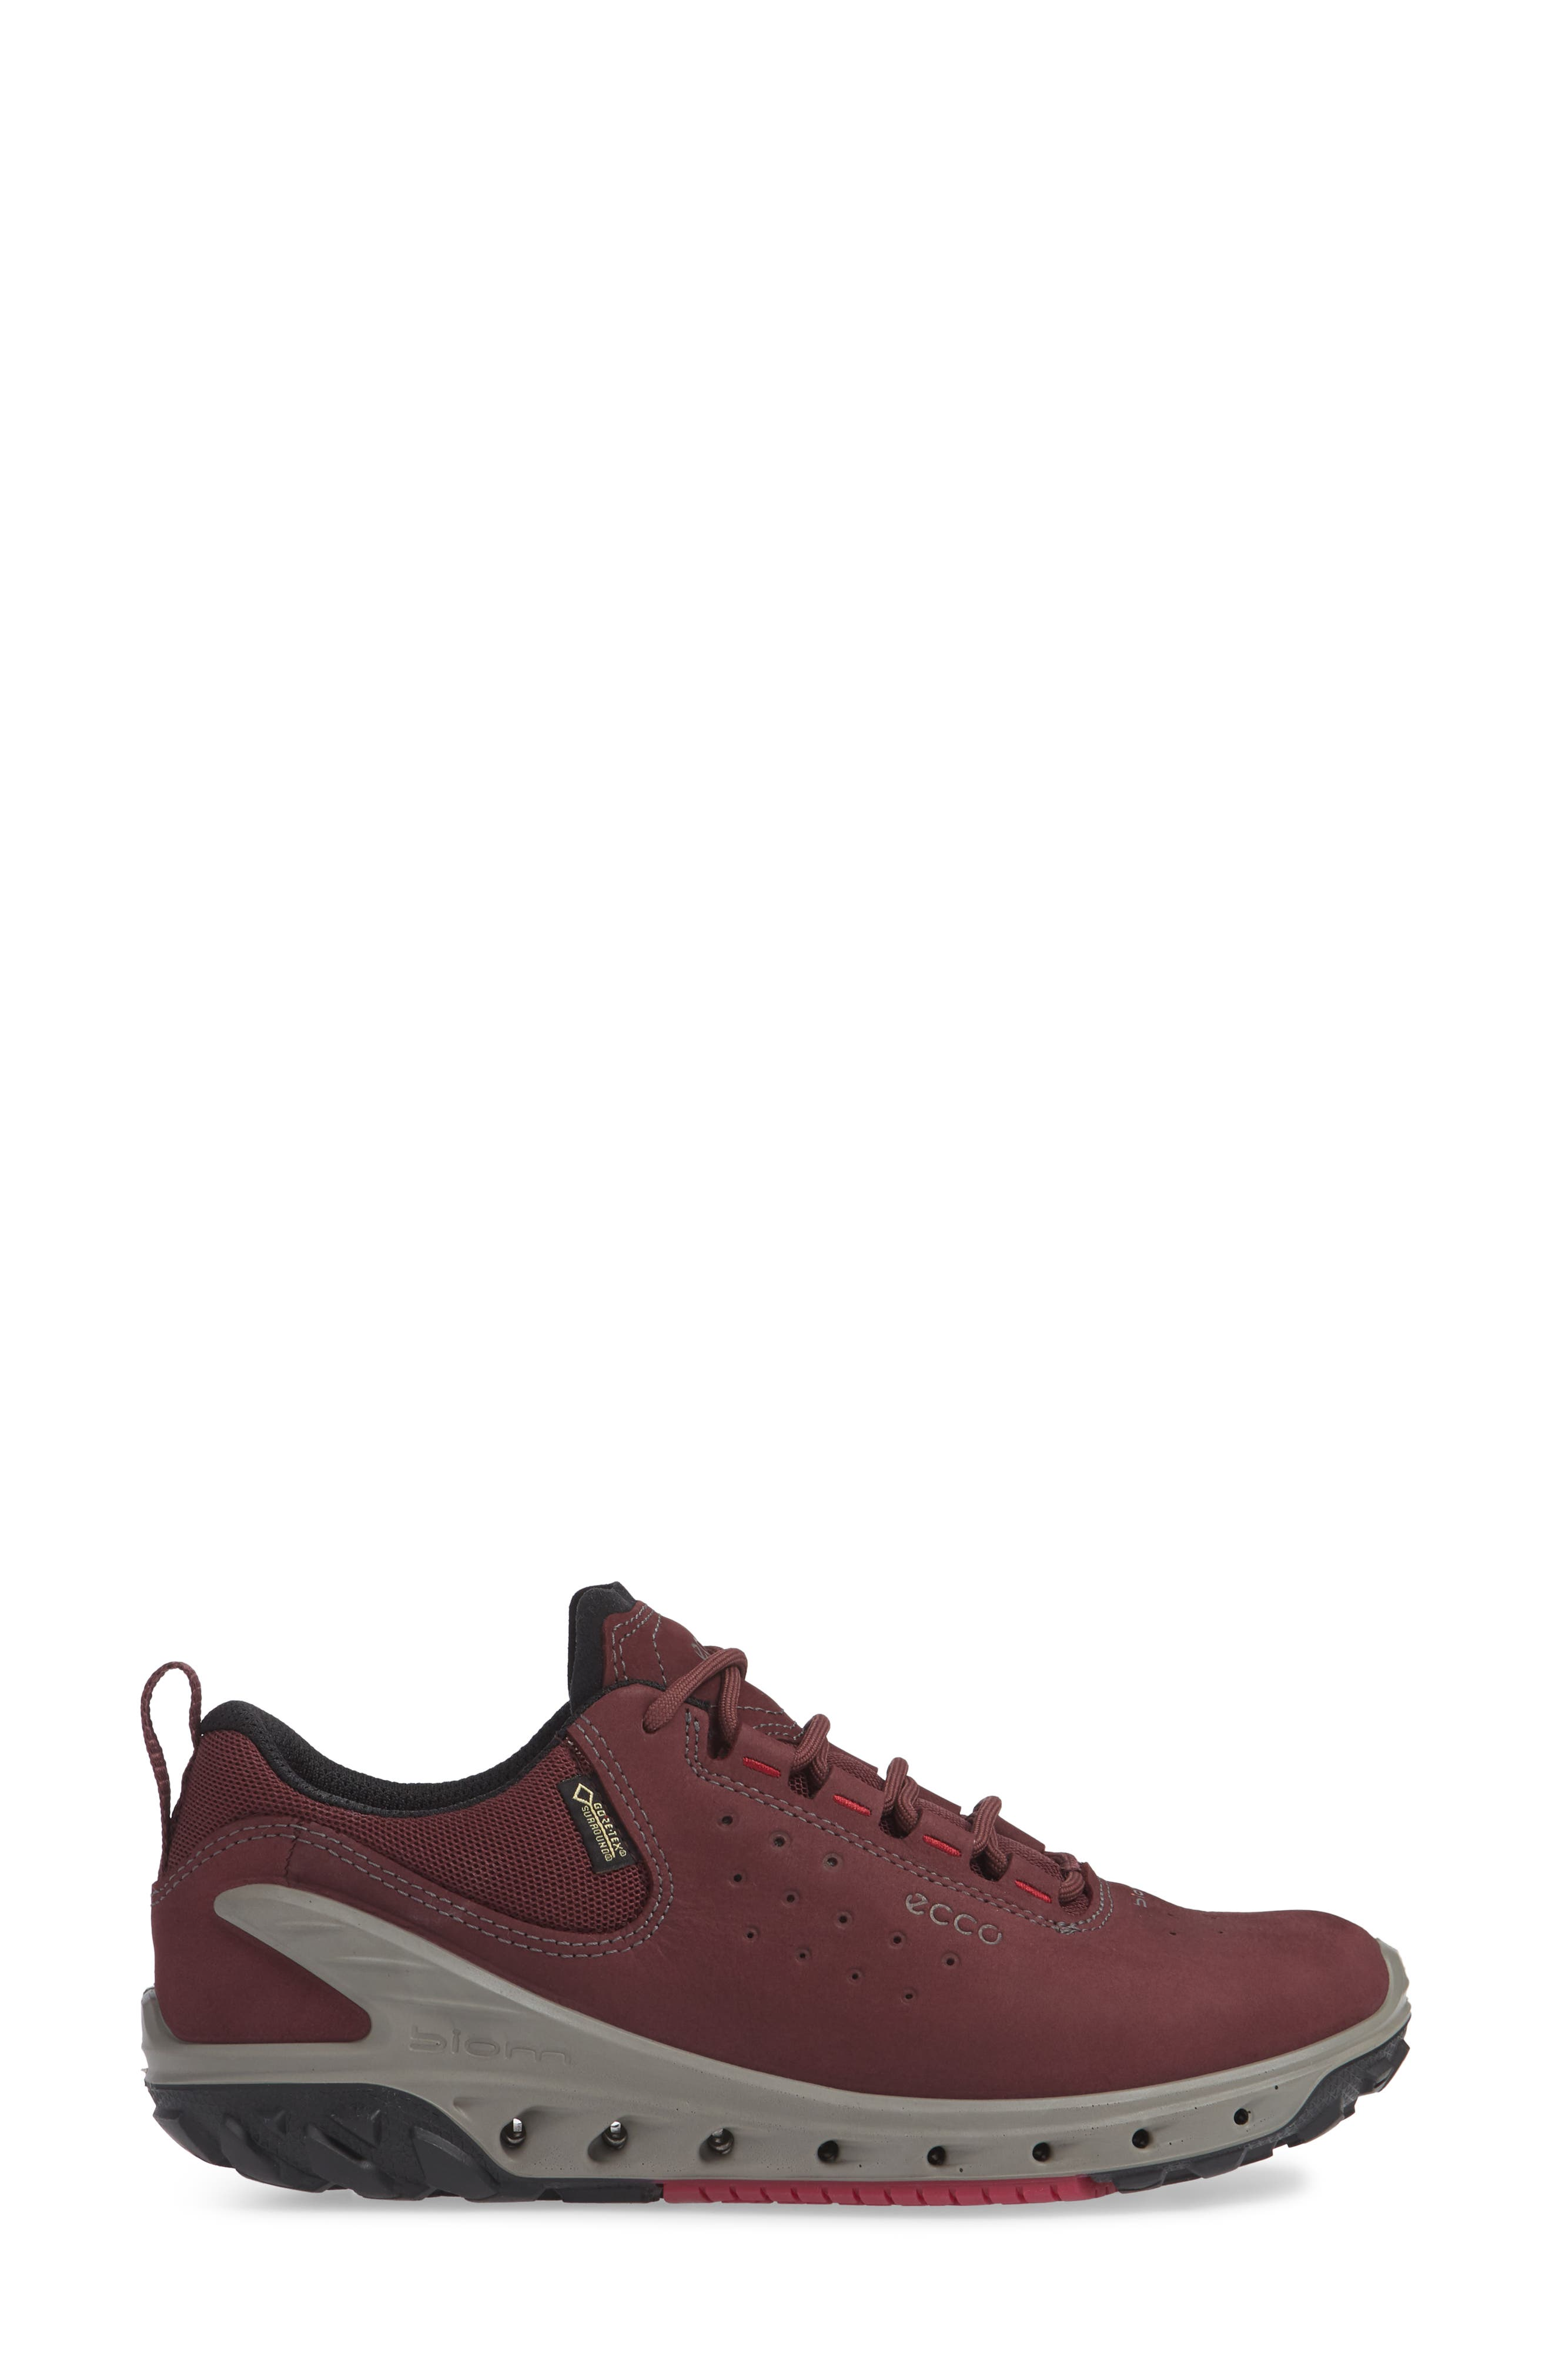 BIOM Venture GTX Sneaker,                             Alternate thumbnail 3, color,                             WINE NUBUCK LEATHER